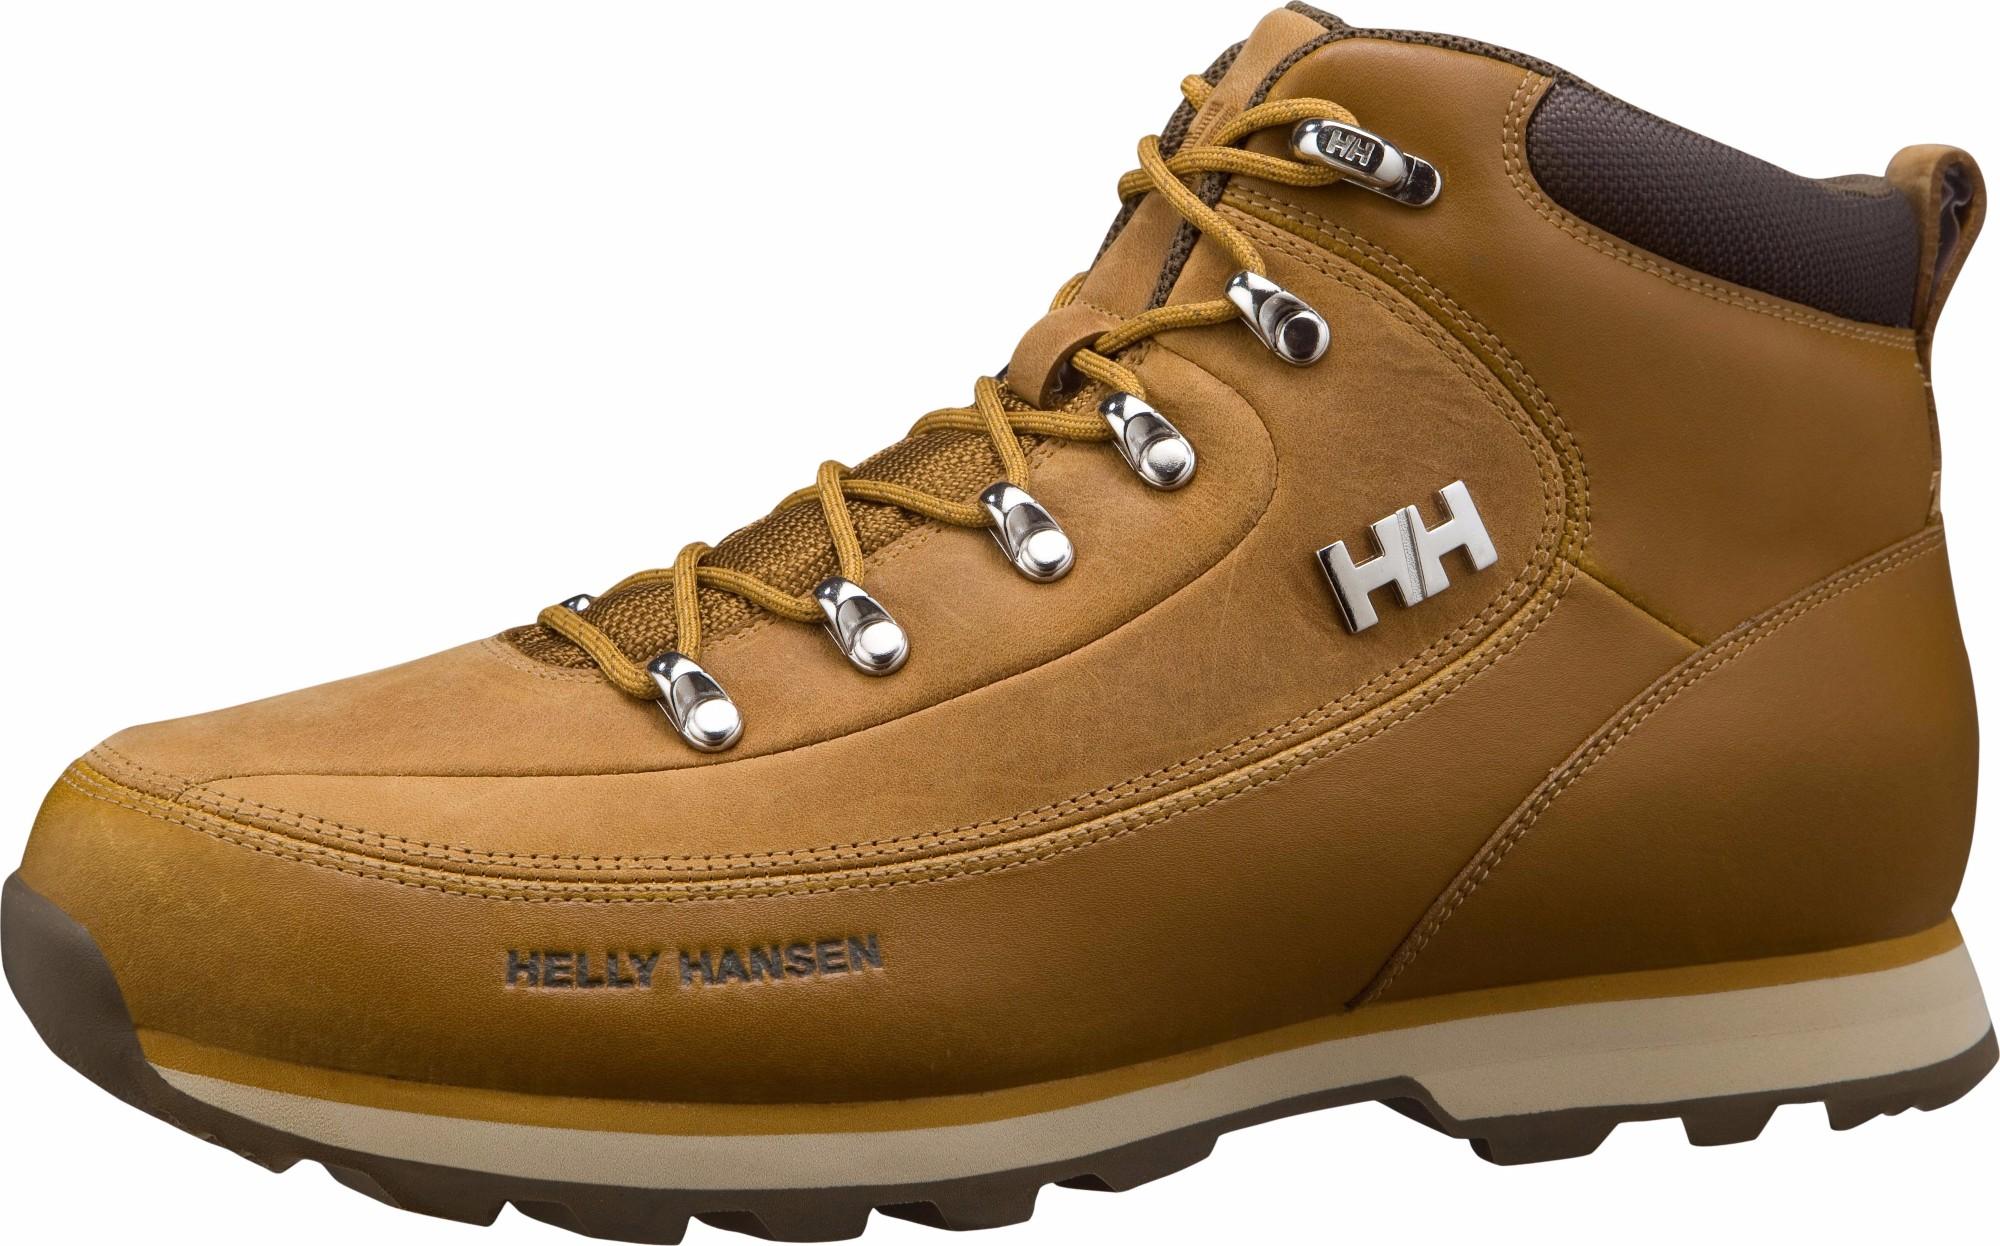 HELLY HANSEN The Forester Bone Brown/HH Khaki 45